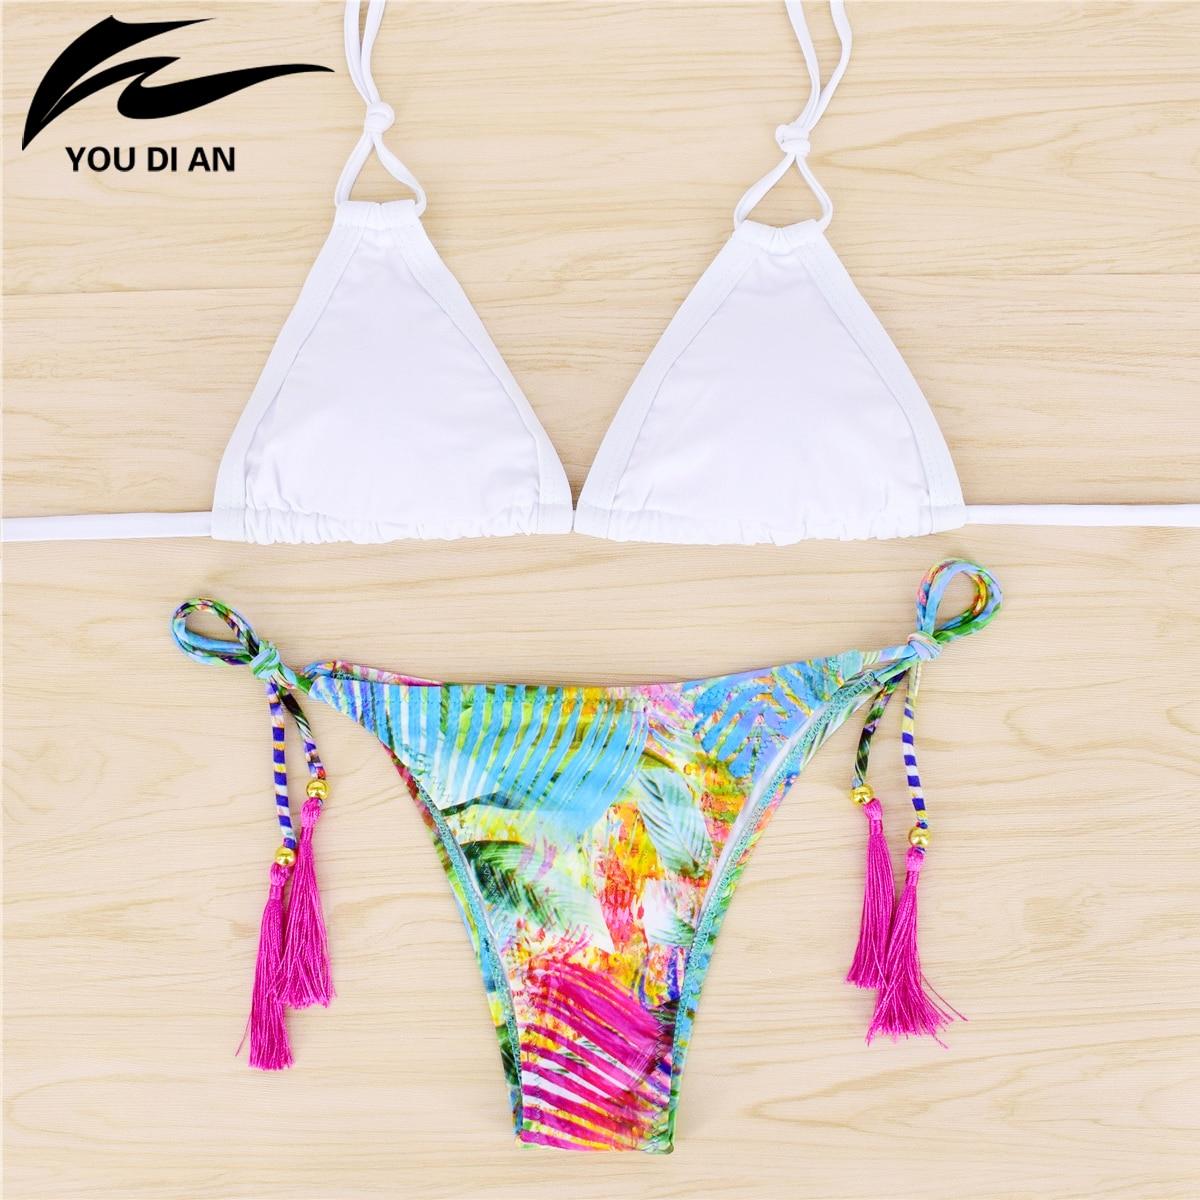 Bikini Mujer Retro Print Biquinis Quick-Drying Bathing Suit Women Washable Bikinis Women 2017 Swimwear Swimsuits Women Costume<br><br>Aliexpress